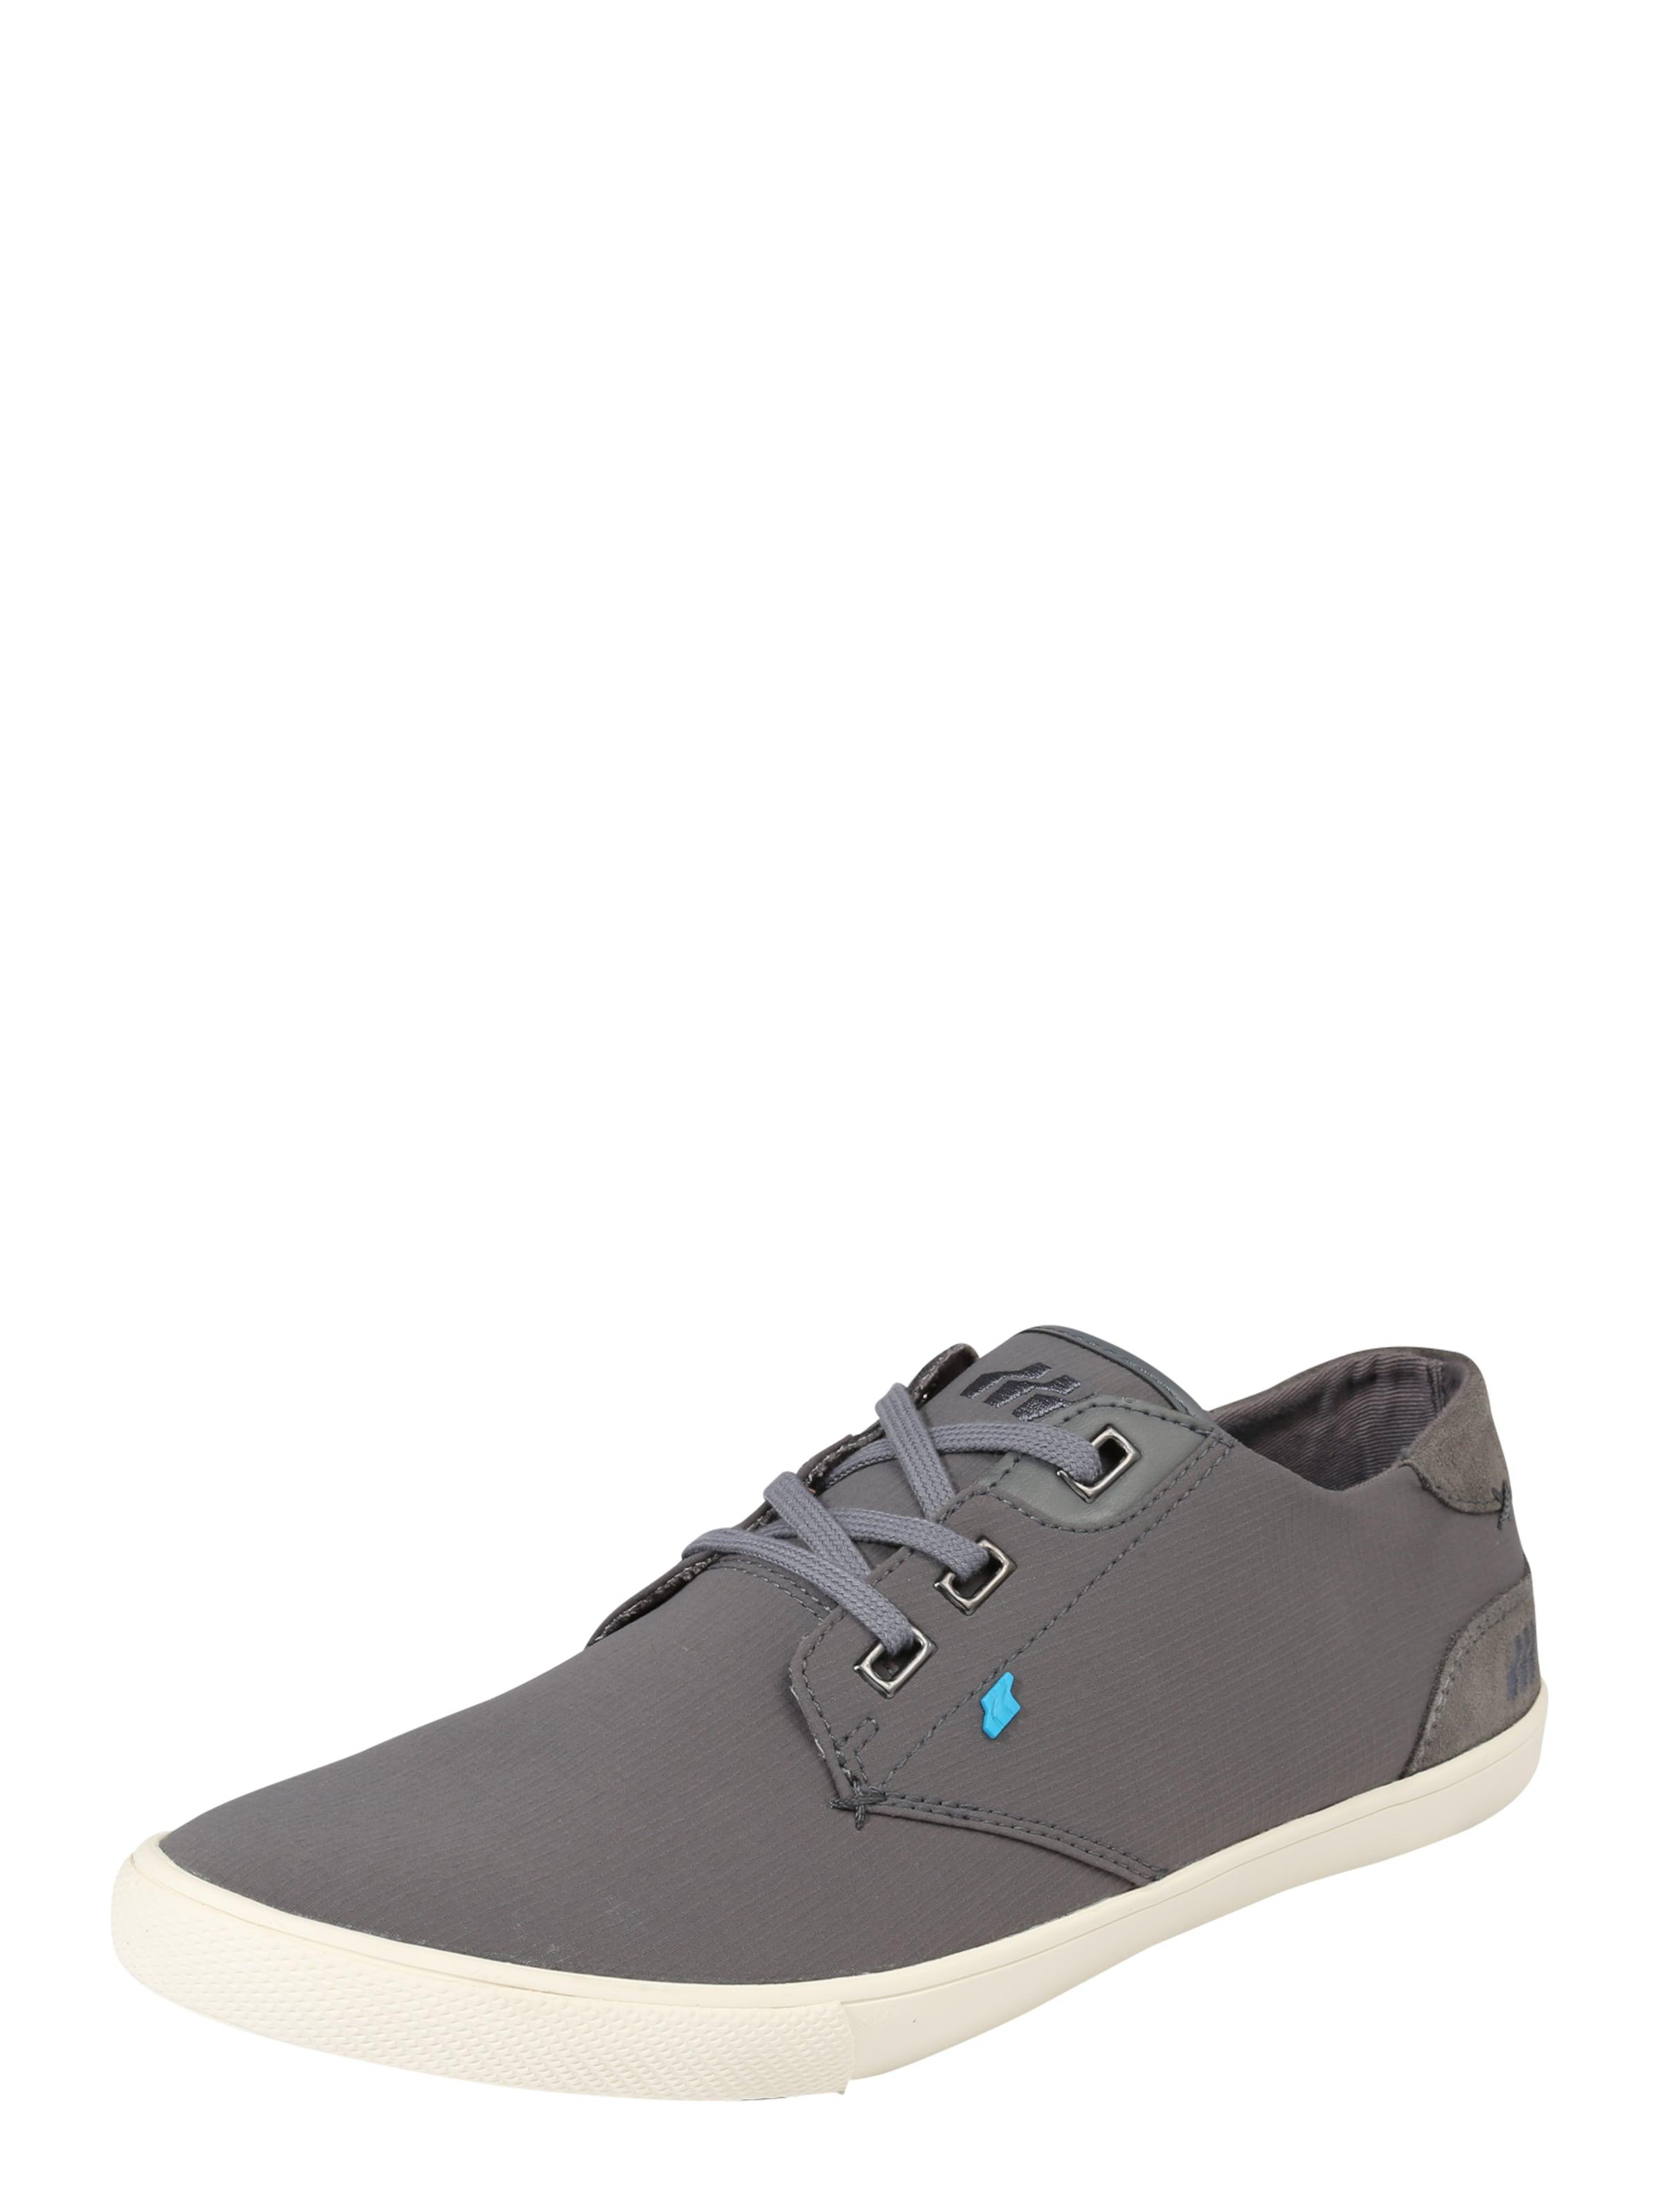 BOXFRESH Sneaker Low STERN Verschleißfeste billige Schuhe